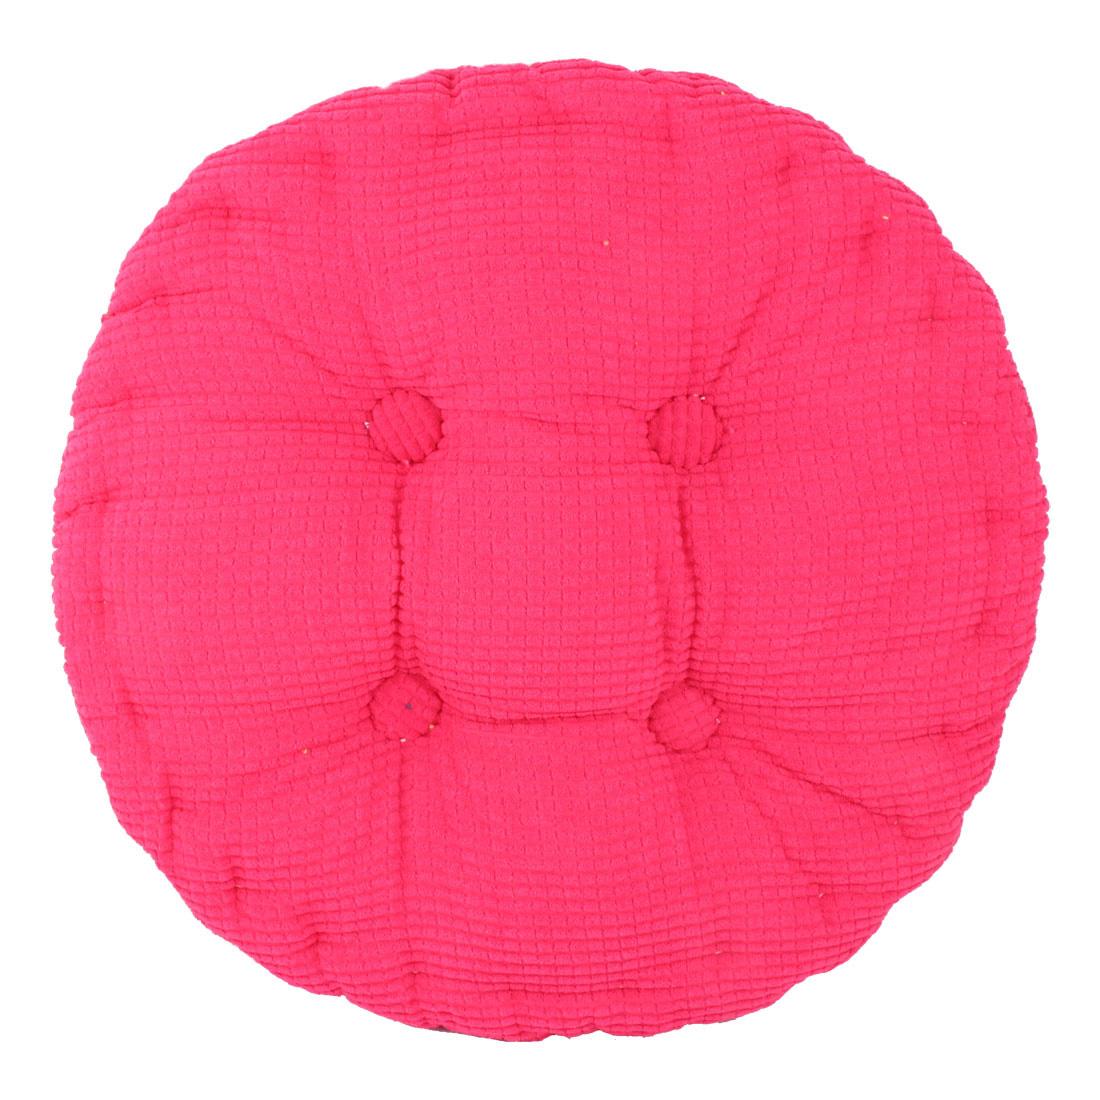 Home Corduroy Round Shaped Thickened Pillow Seat Chair Cushion Pad Mat Fuchsia